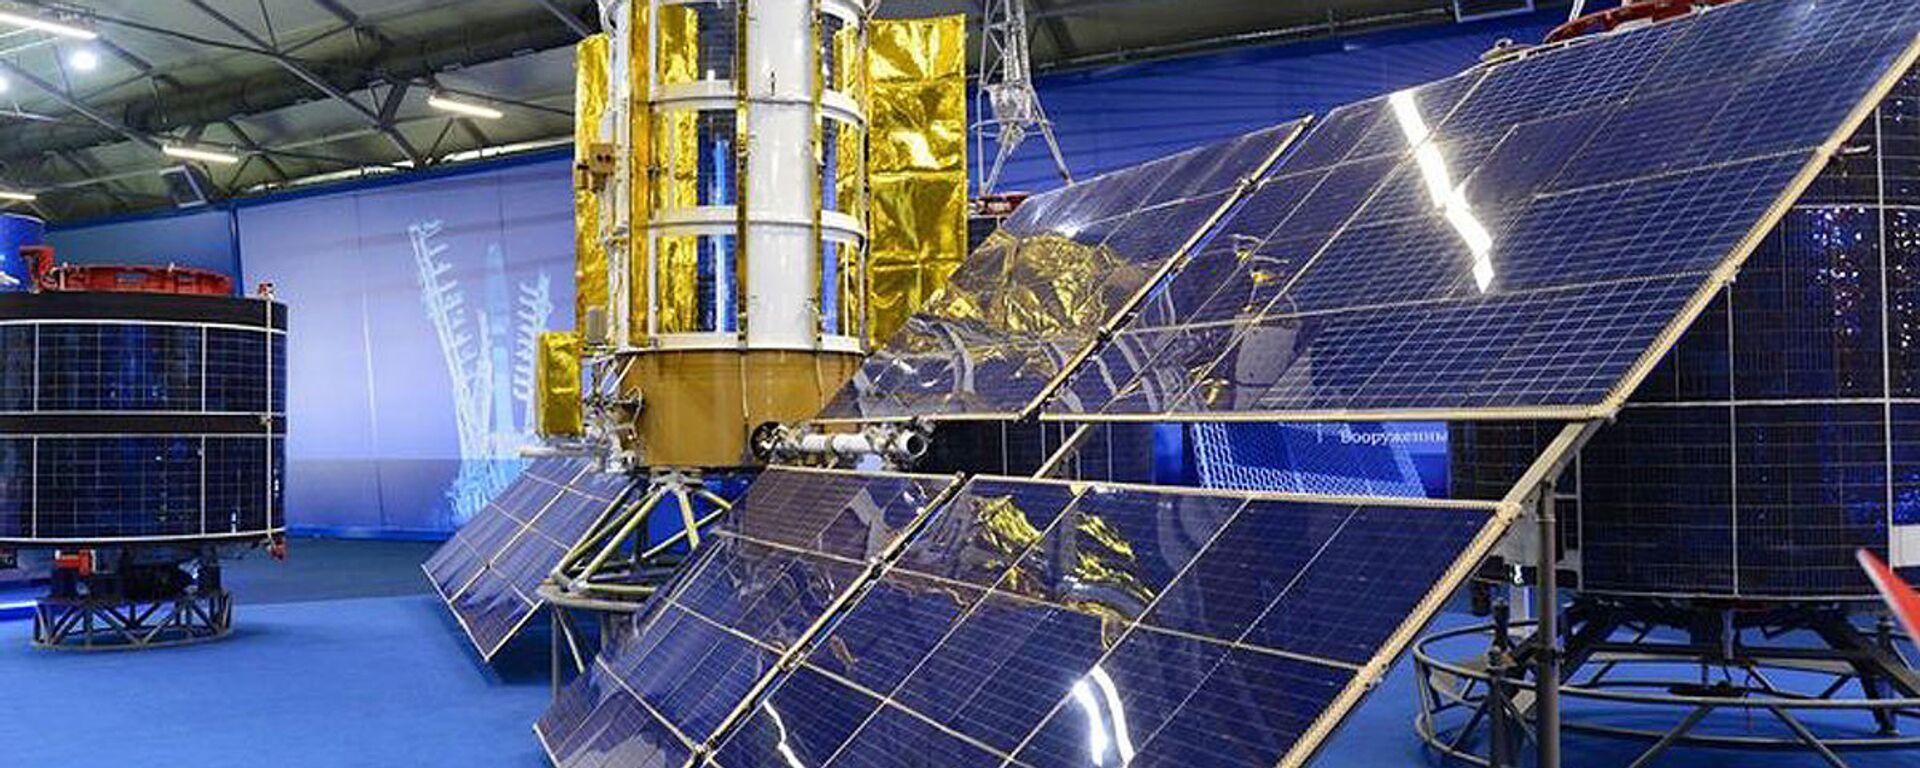 Družice GLONASS-K - Sputnik Česká republika, 1920, 13.07.2021